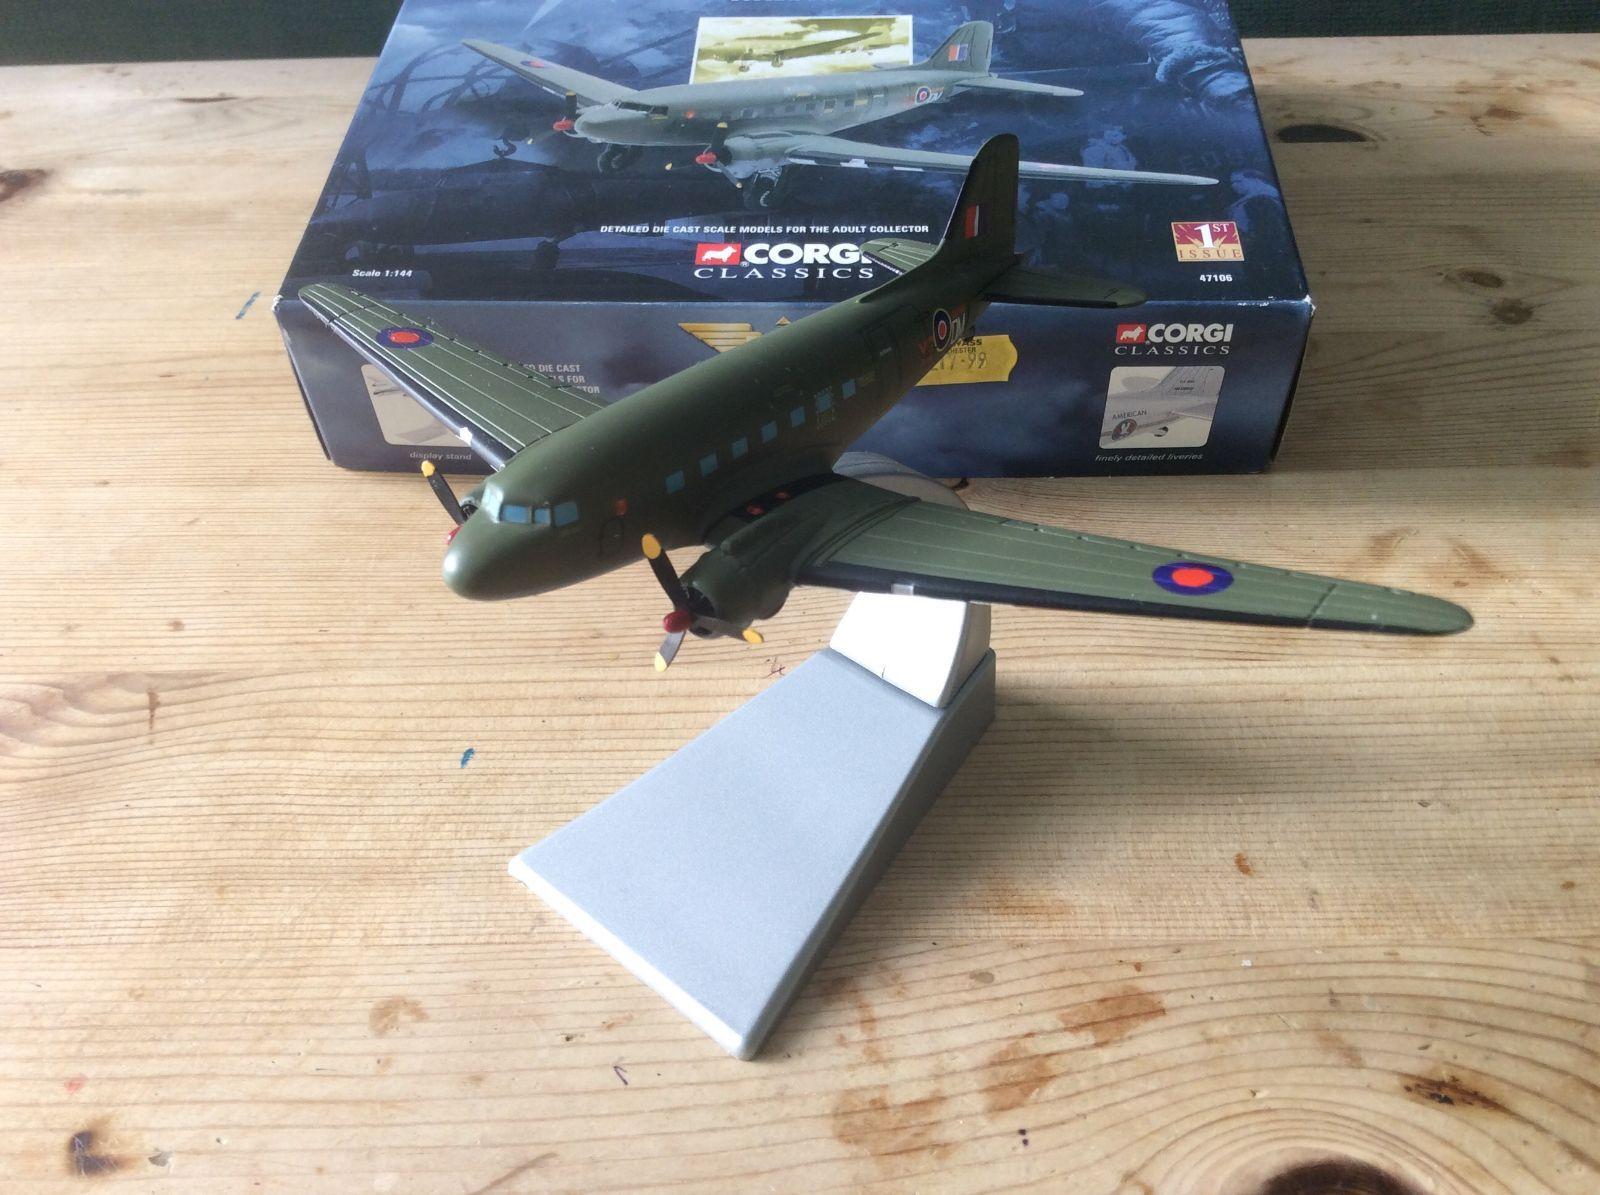 Douglas DC3 - RAF Battle of of of Britain Mem  Corgi Aviation 47106 MIB - 1 144 Scale dfaddf